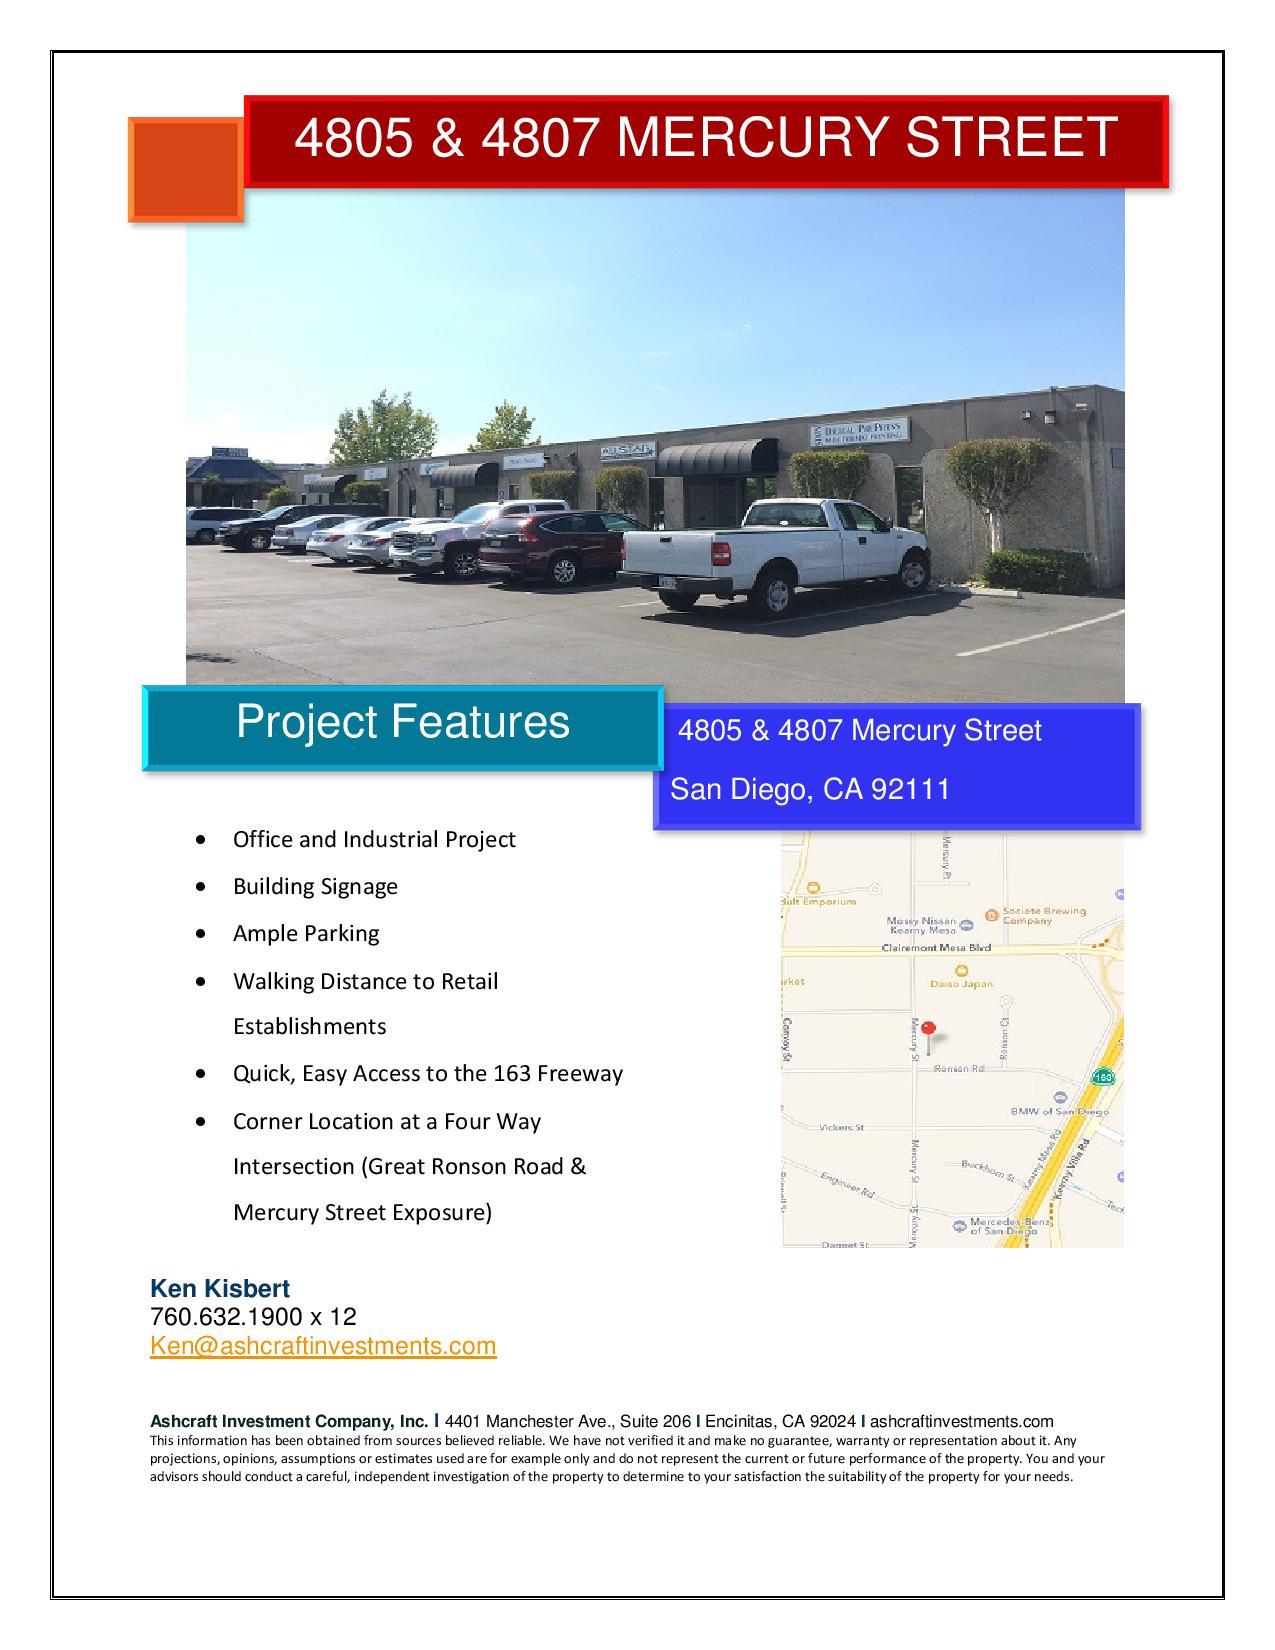 MER marketing flyer — Ashcraft Investment Company, Inc